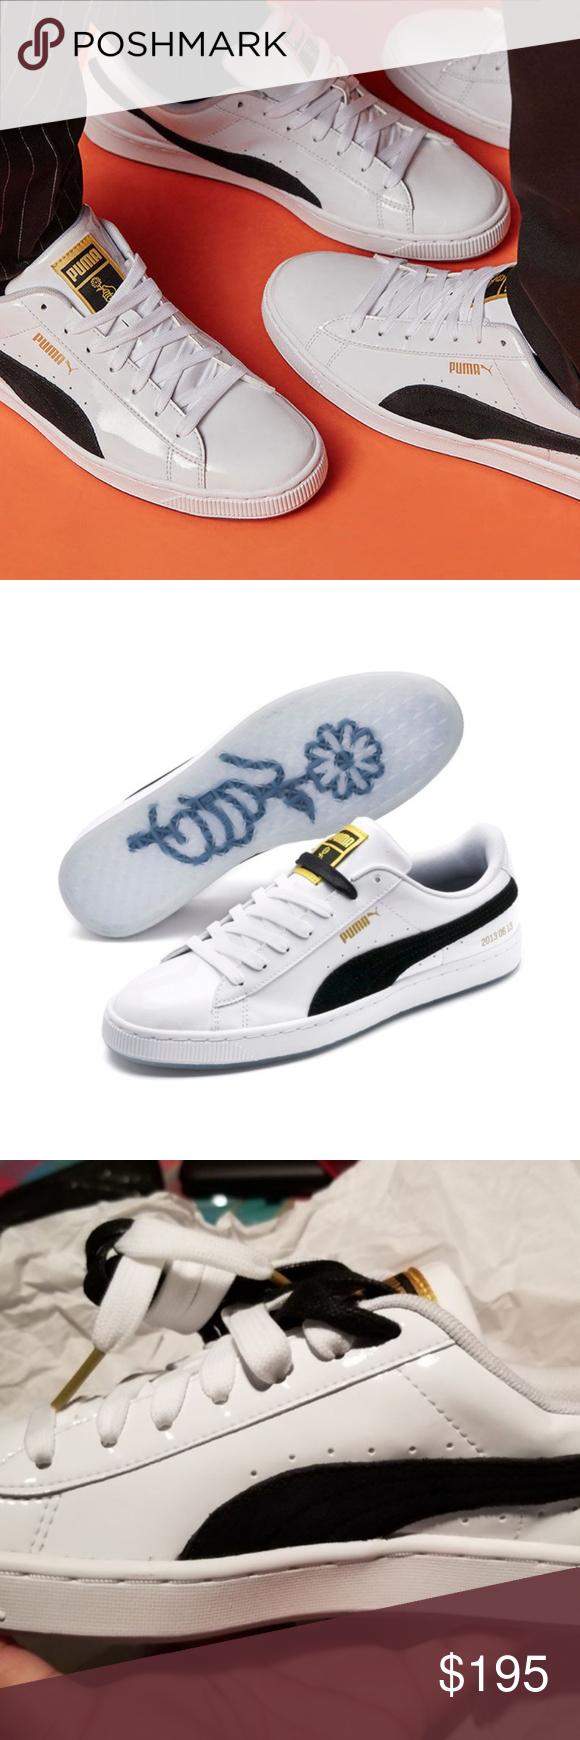 buy online 19ad7 b6fed PUMA x BTS Basket Patent Sneakers PHOTOMIX PUMA x BTS Basket ...